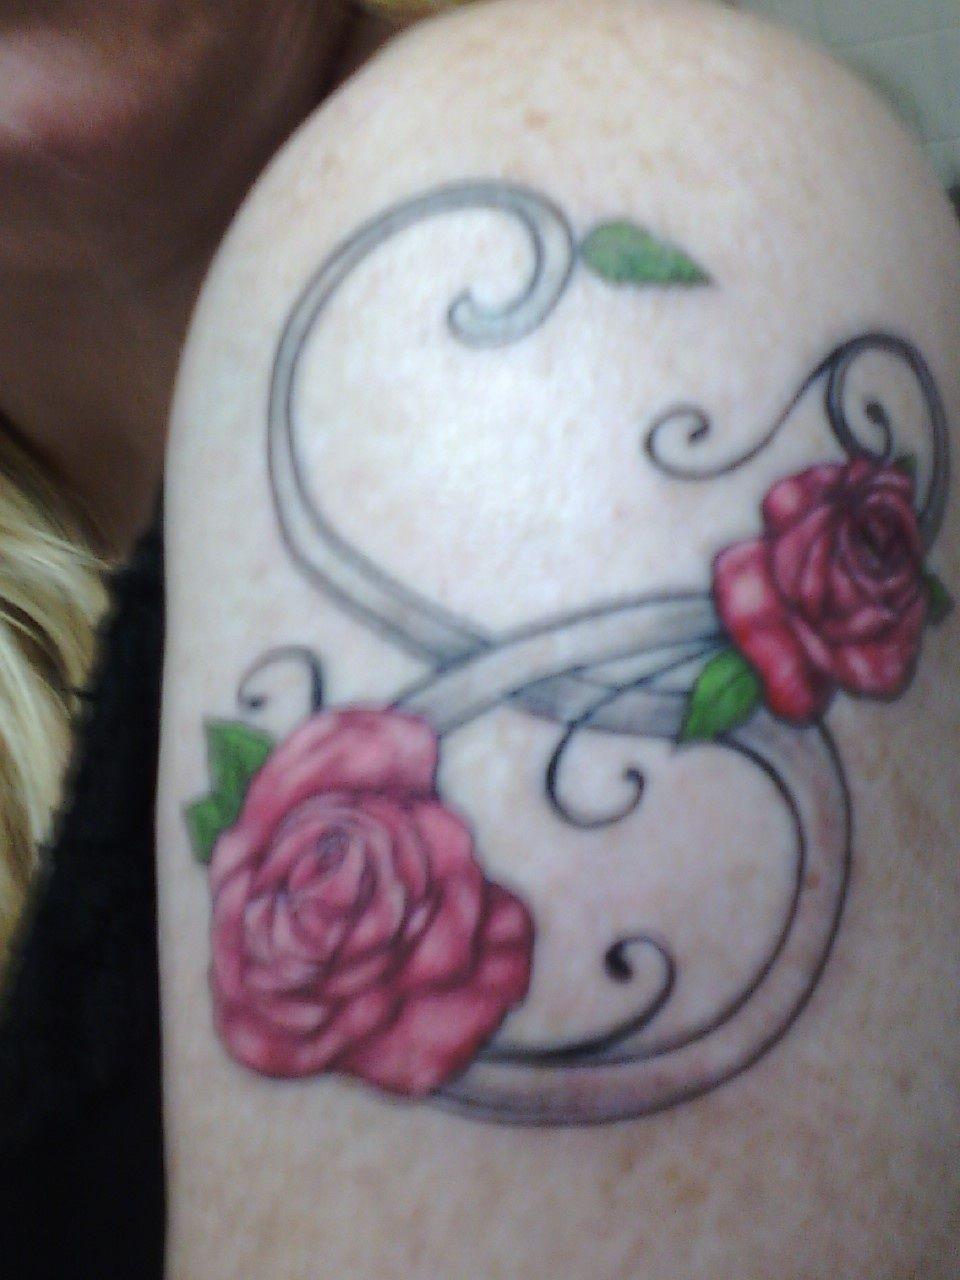 Taurus Symbol Tattoo I Love It Ink My Whole Body Pinterest